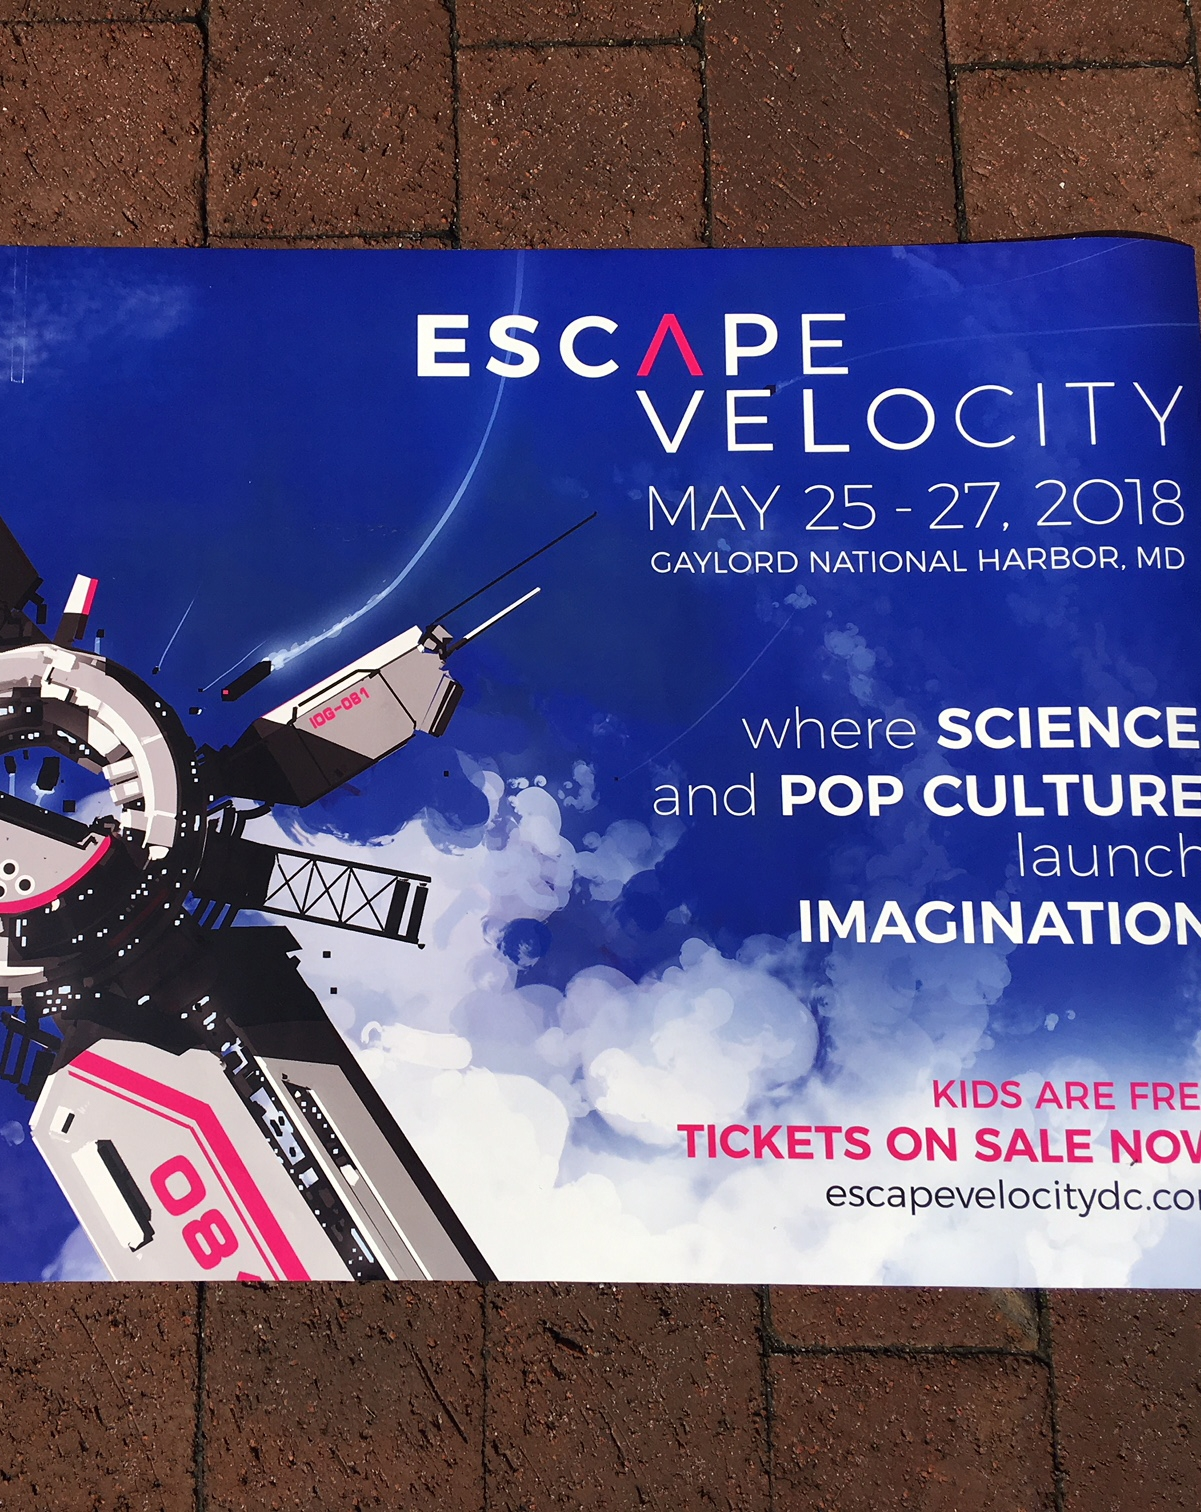 Escape Velocity event outdoor banner